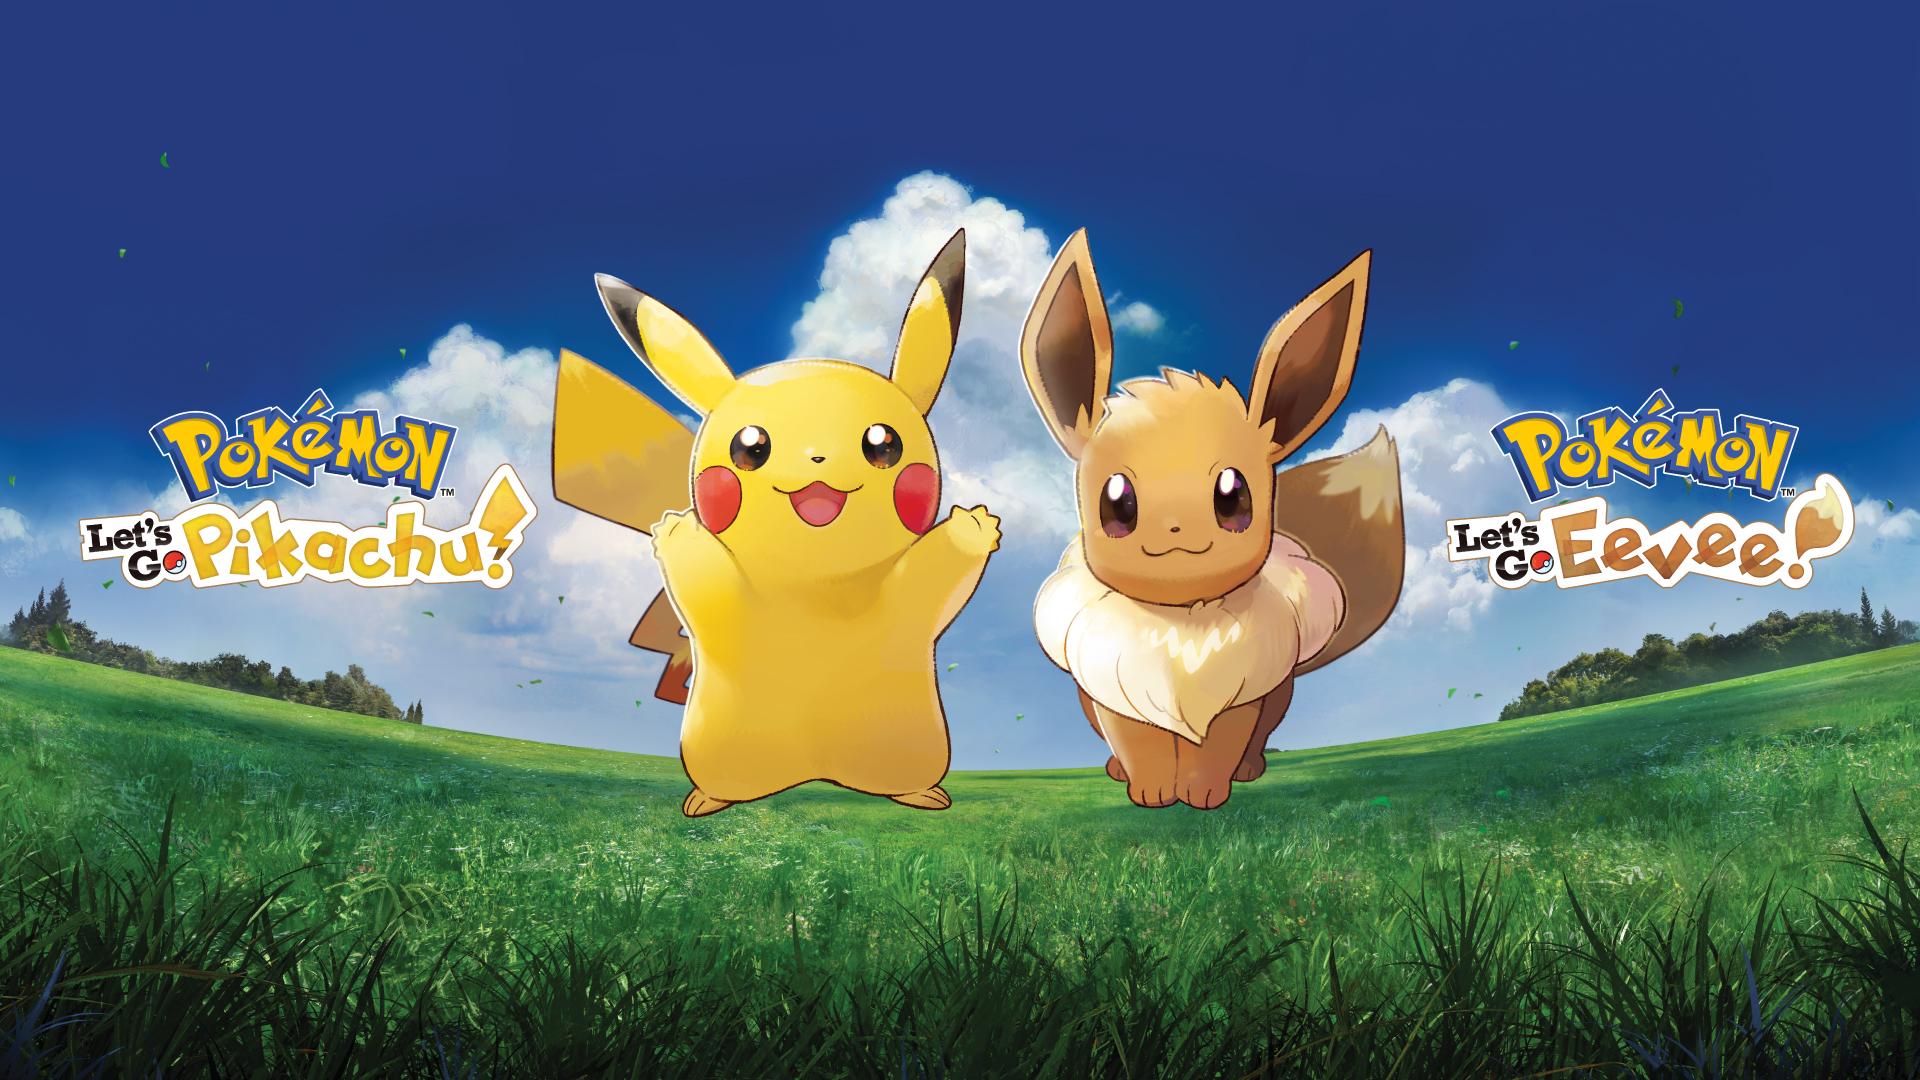 Pokemon Let S Go Pikachu Amp Let S Go Eevee Wallpaper